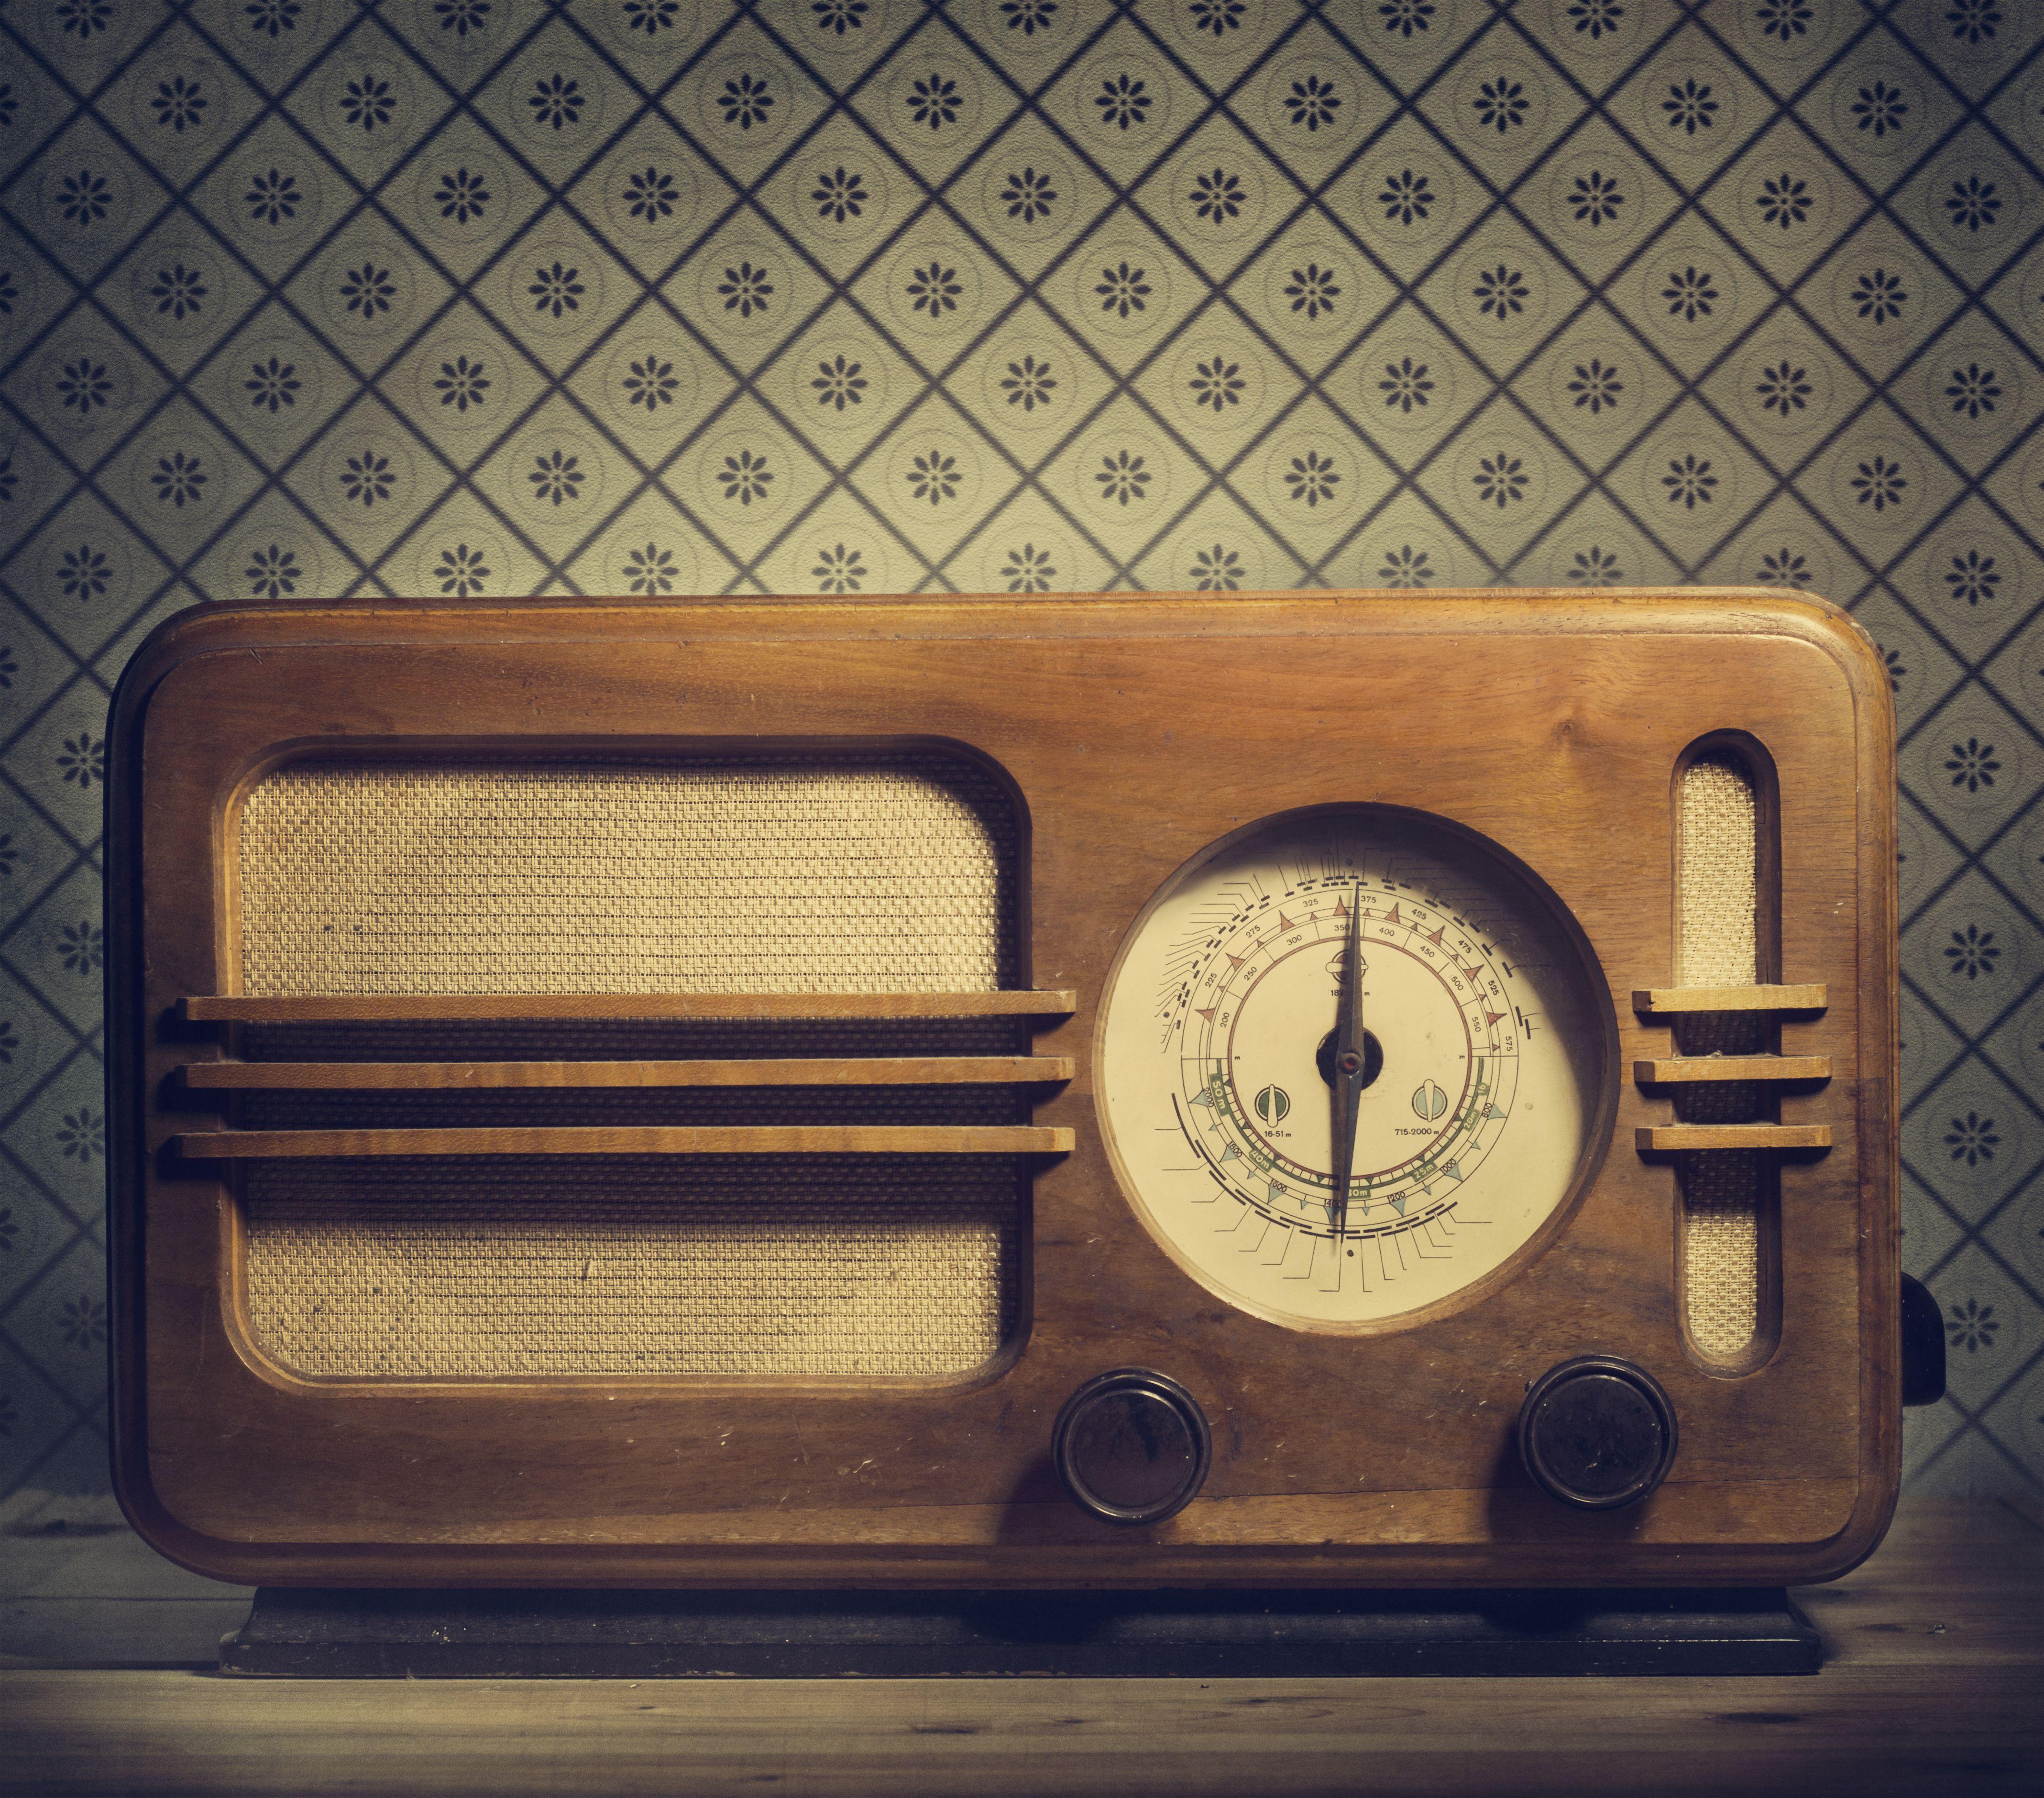 radio-vintage-counter-top-style.jpg (4274×3759) | Radios, Phones ...